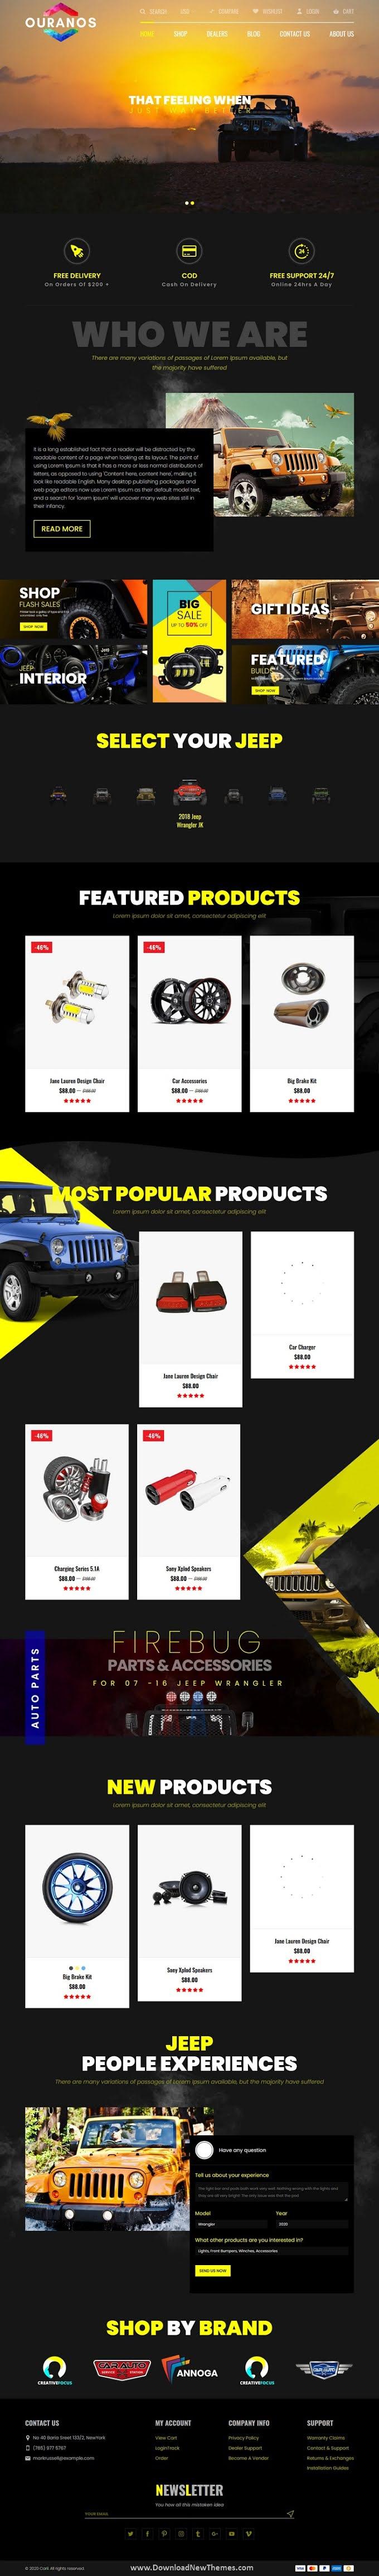 Automotive Shopify Theme for Cars & Auto